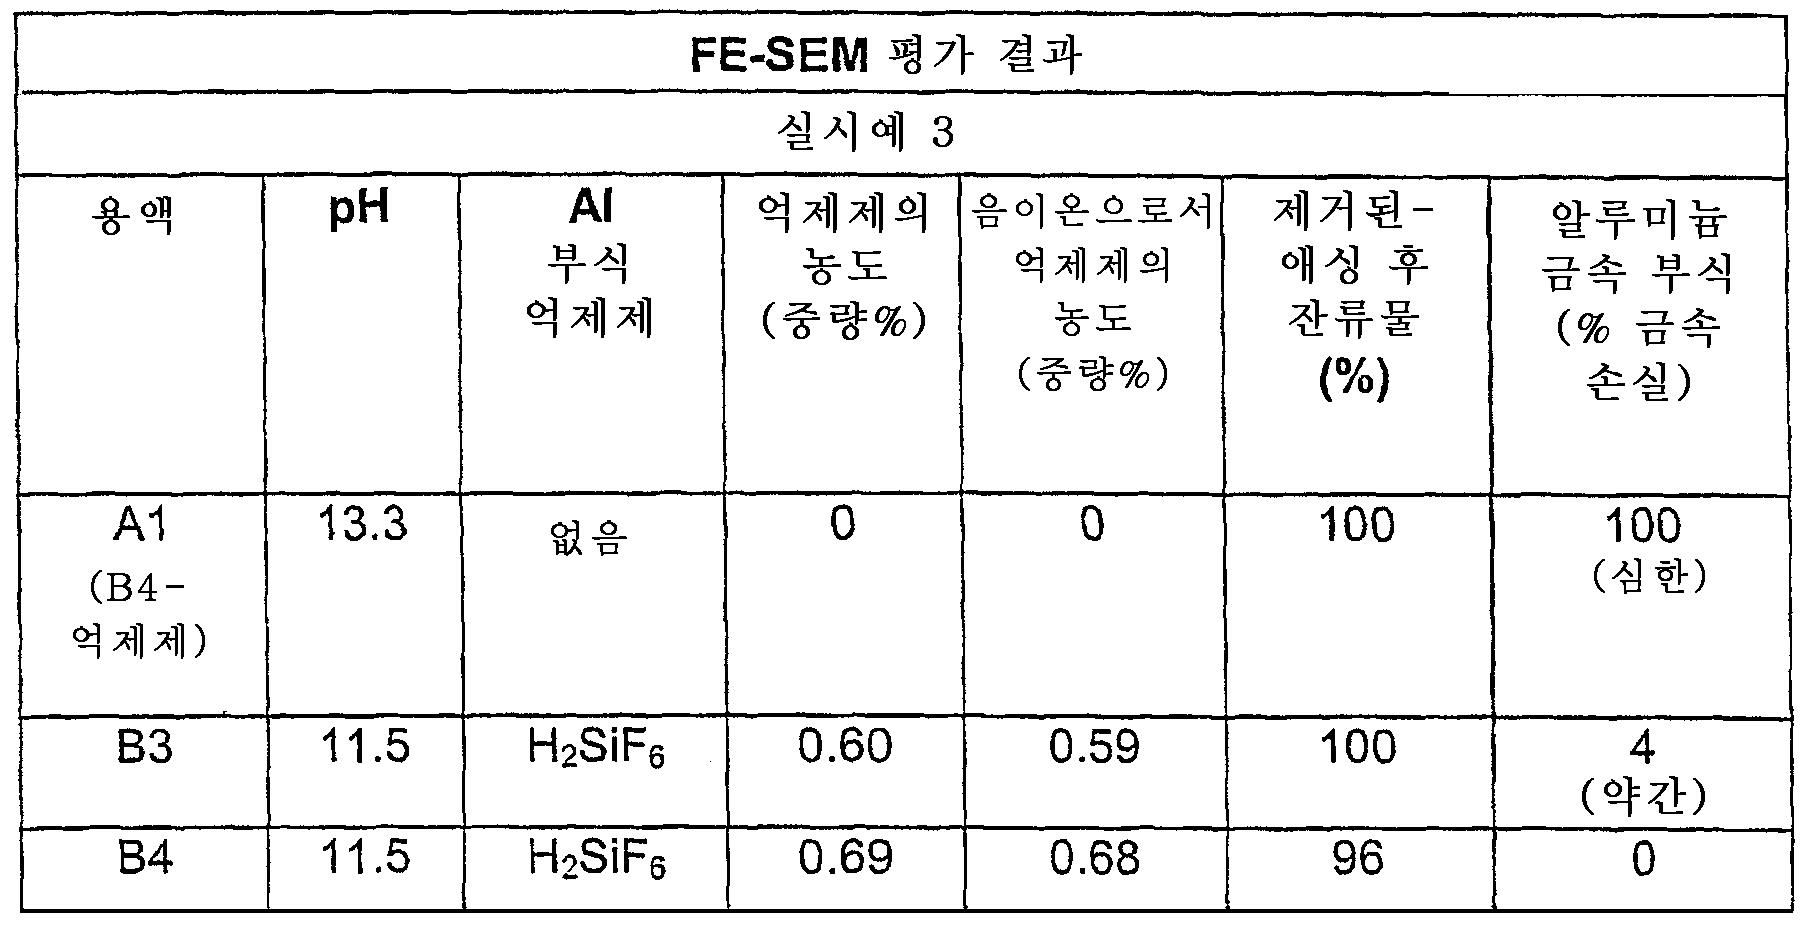 KR101132533B1 - 알칼리성, 플라즈마 에칭/애싱 후 잔류물